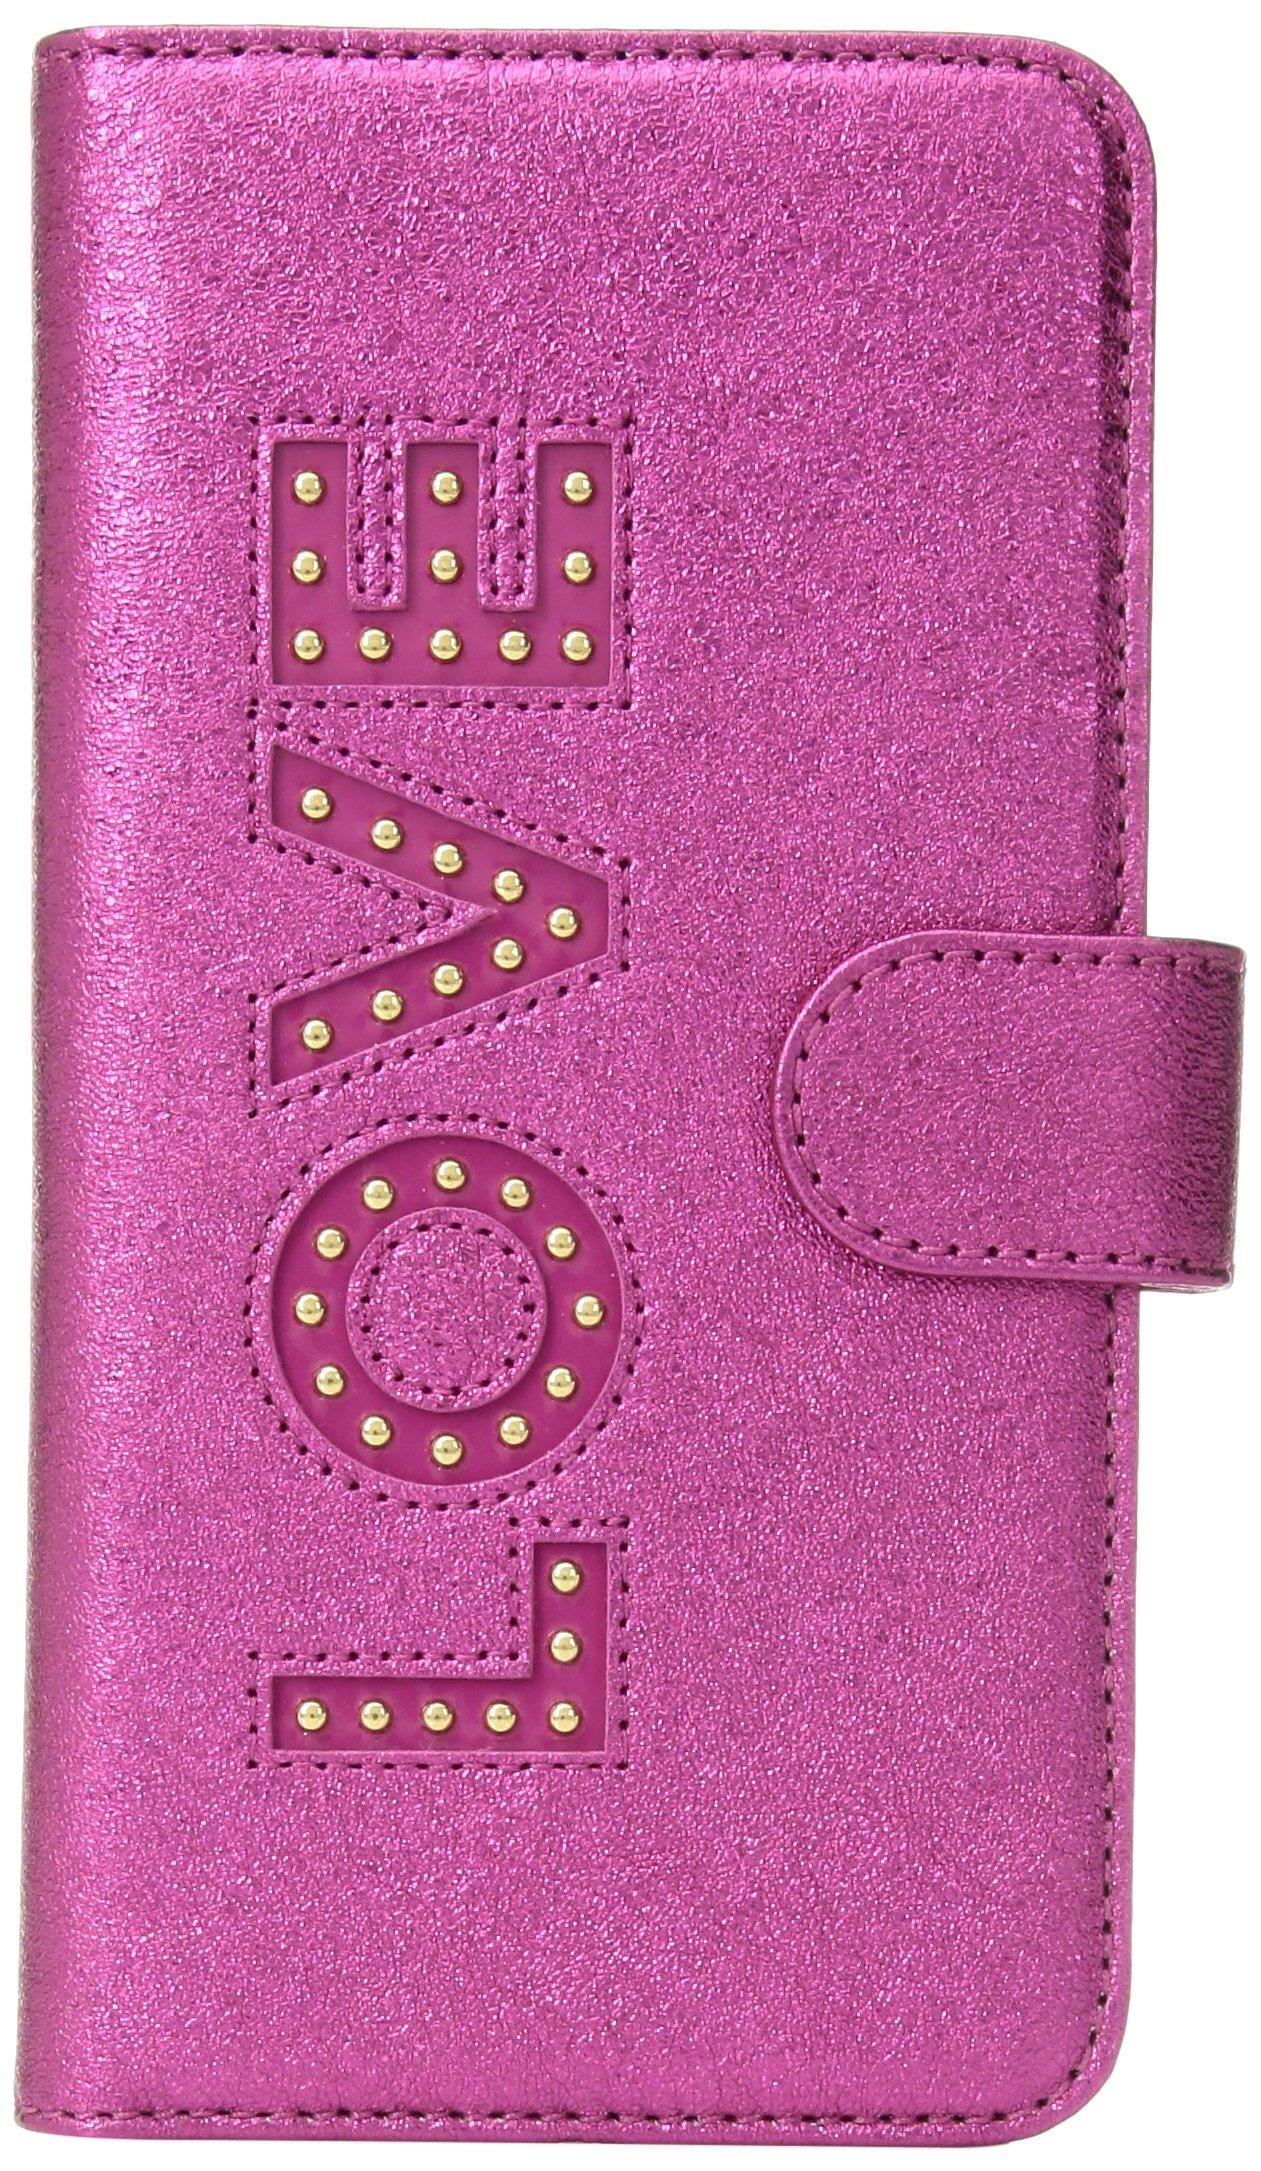 Michael Kors Love Folio Phn Cse Tab 7+, Ultra Pink